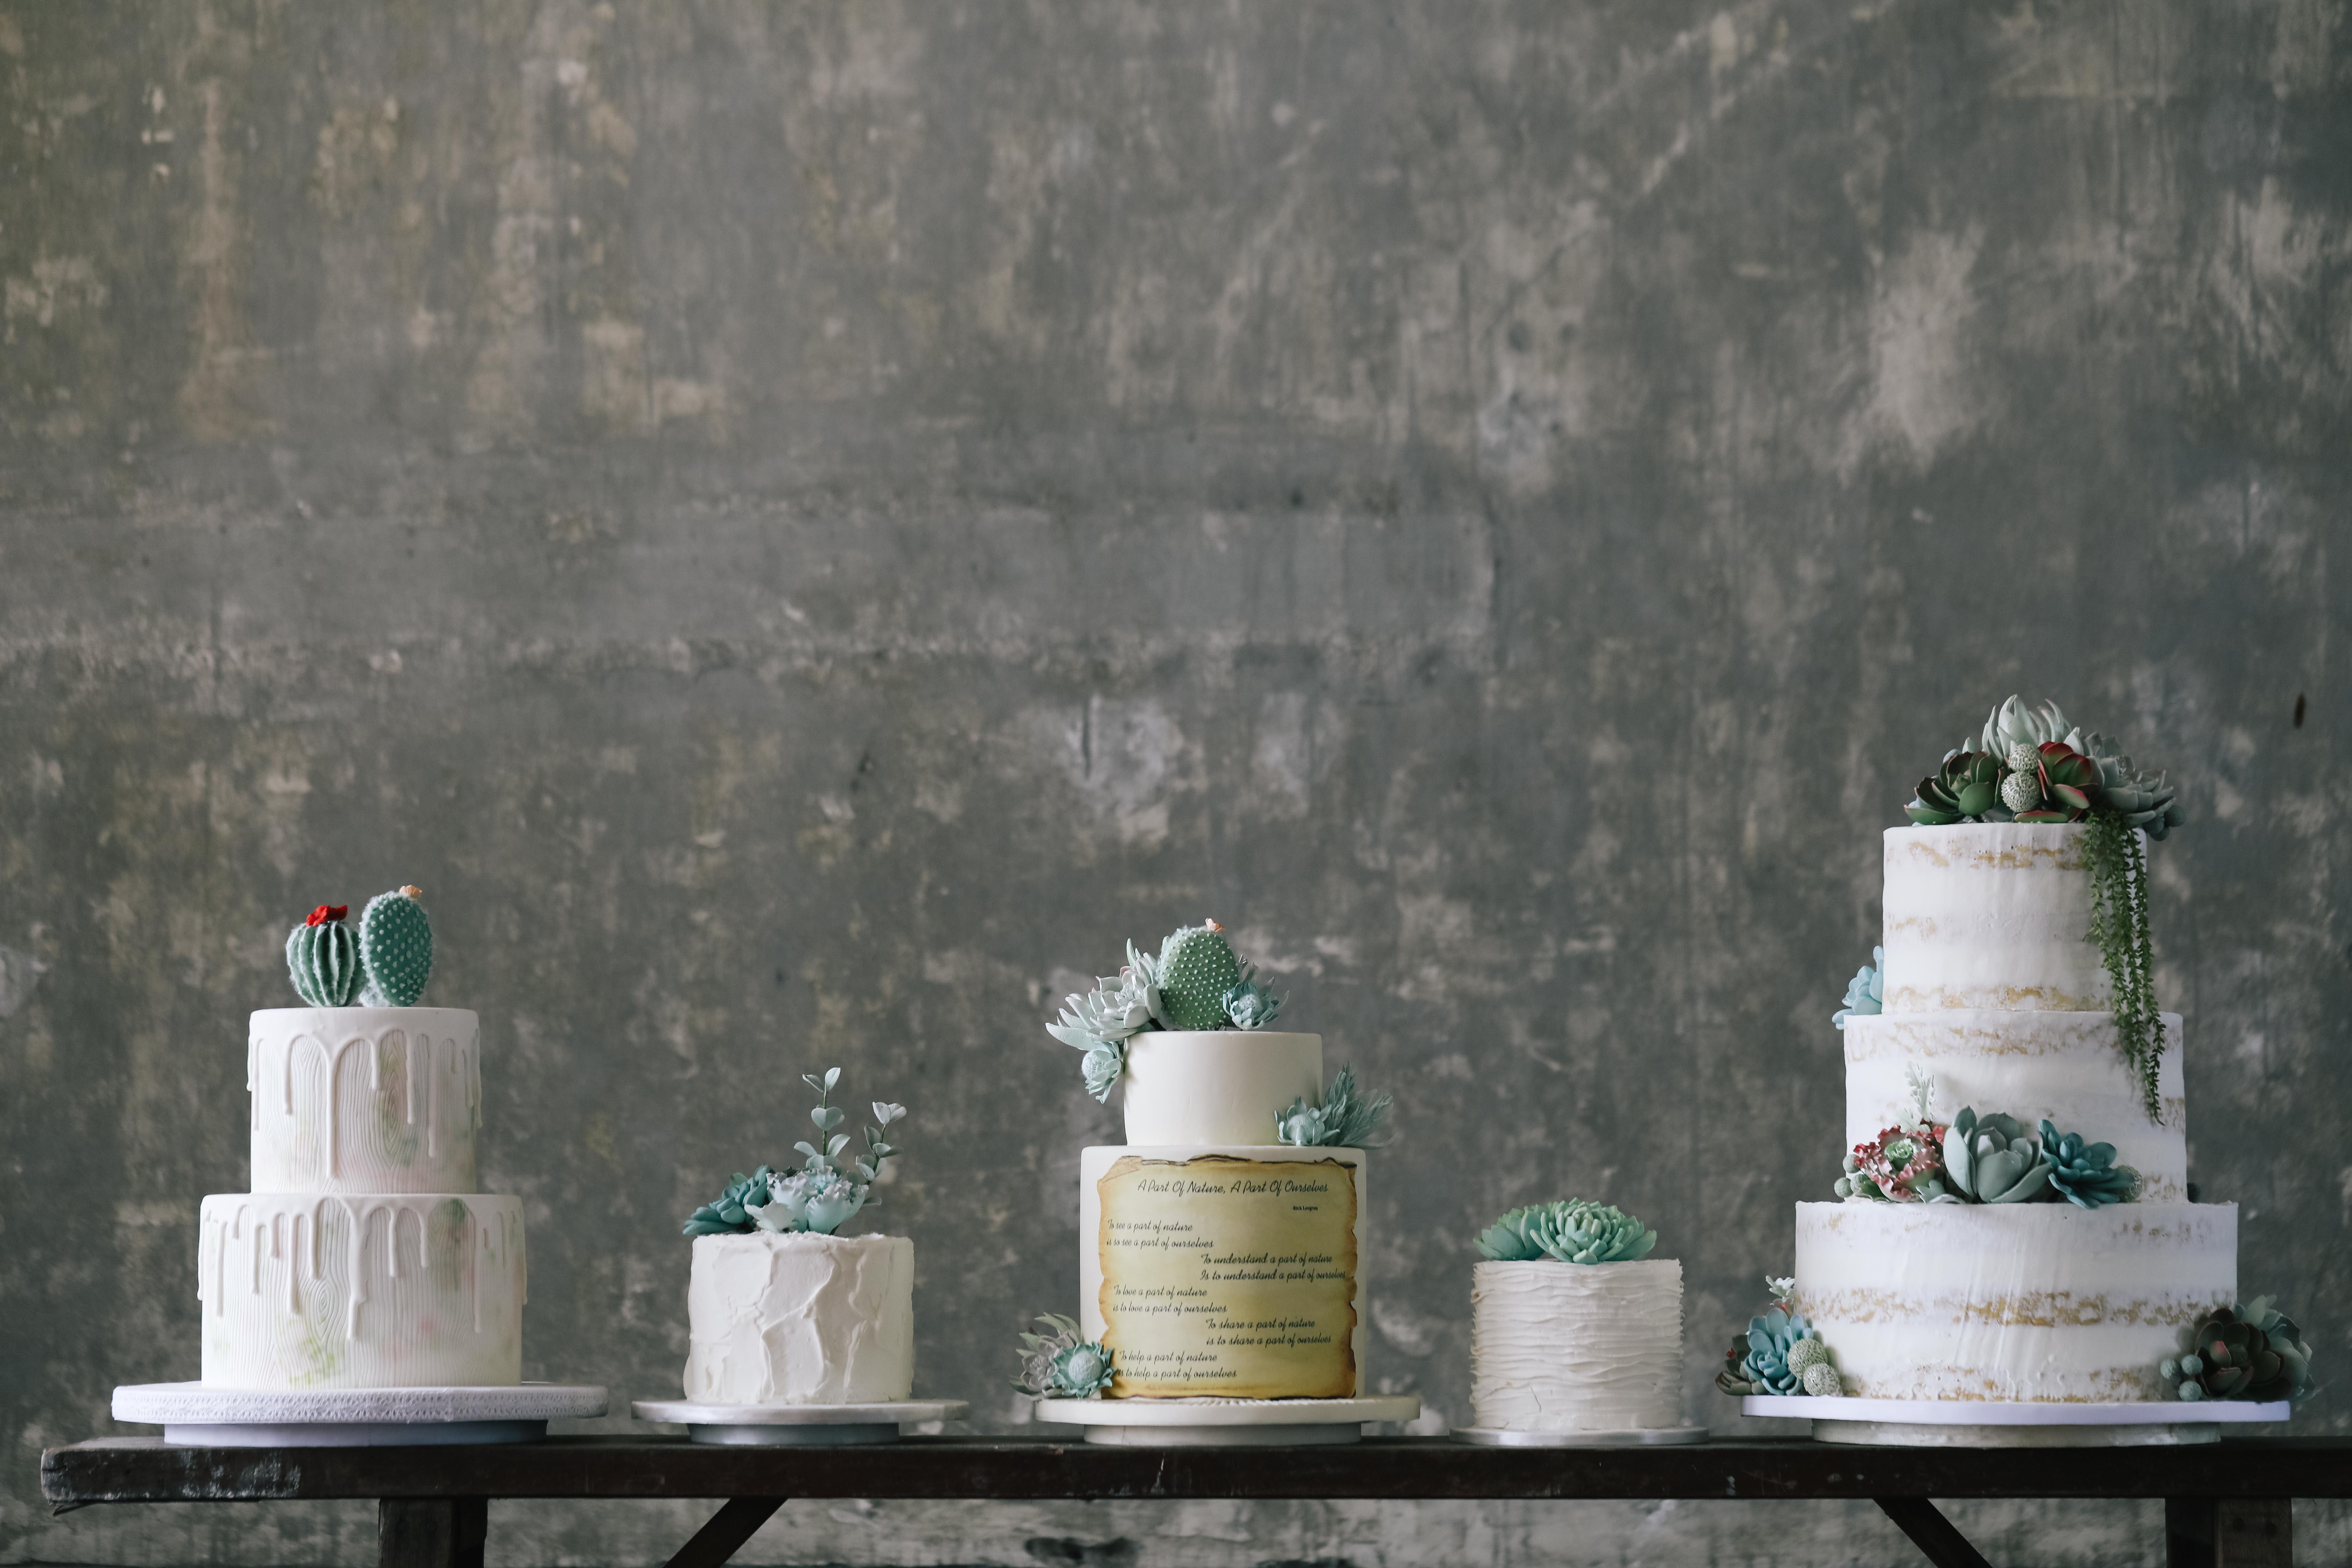 4 Wedding Cake Decoration Ideas for a Personalized Wedding Image 1